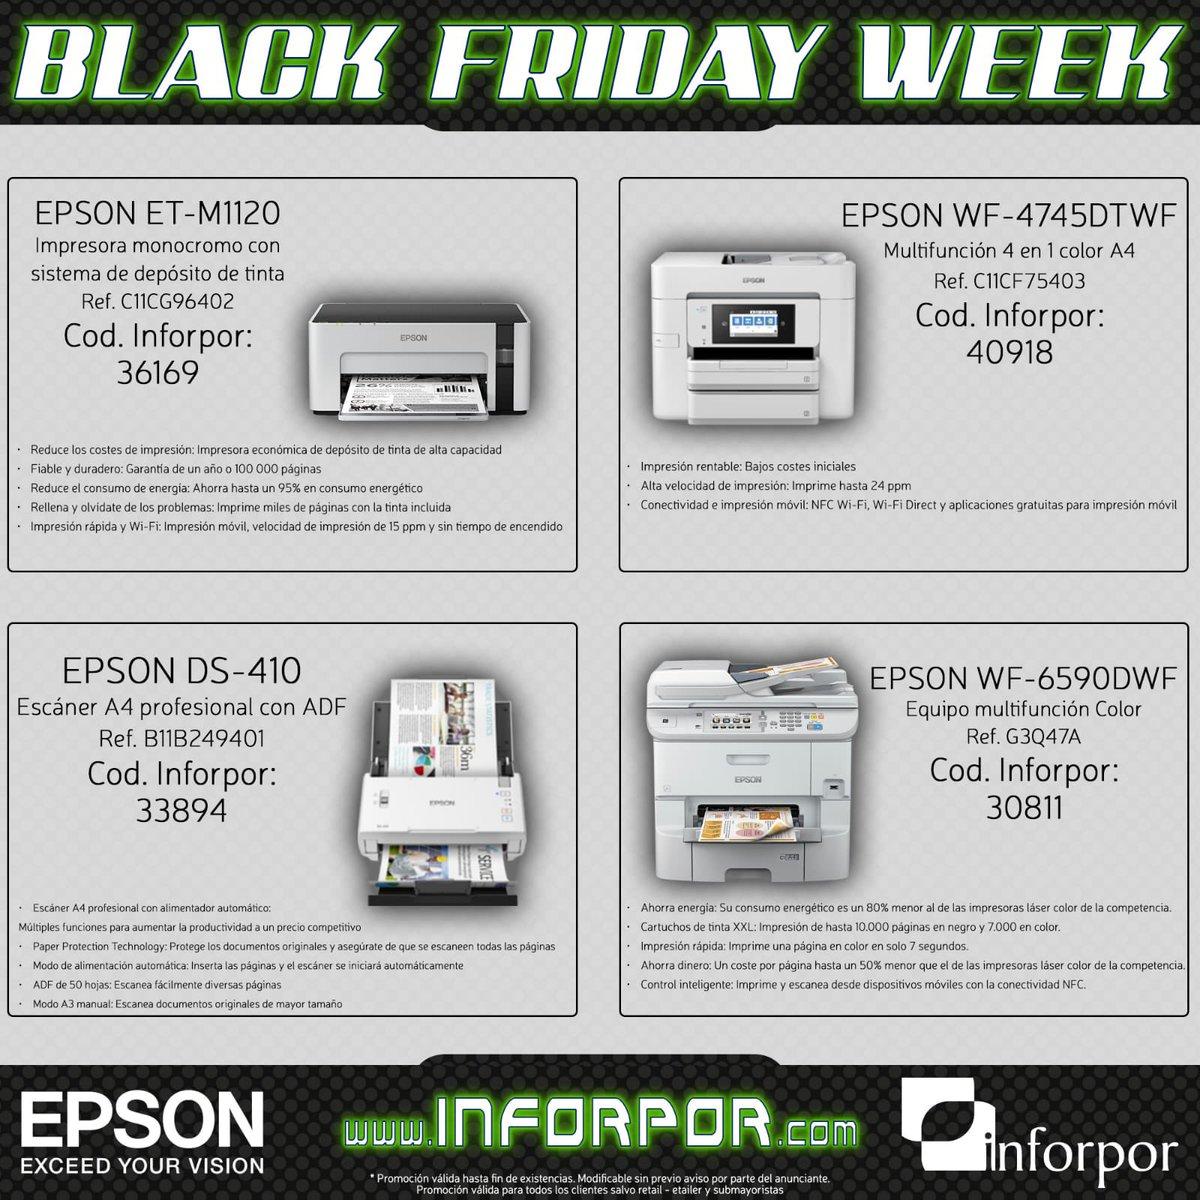 Ofertas @Epson_ES en la semana #BlackFridayWeek  #impresora #mfp #escaner  #tinta #monocromo #ecotank #color